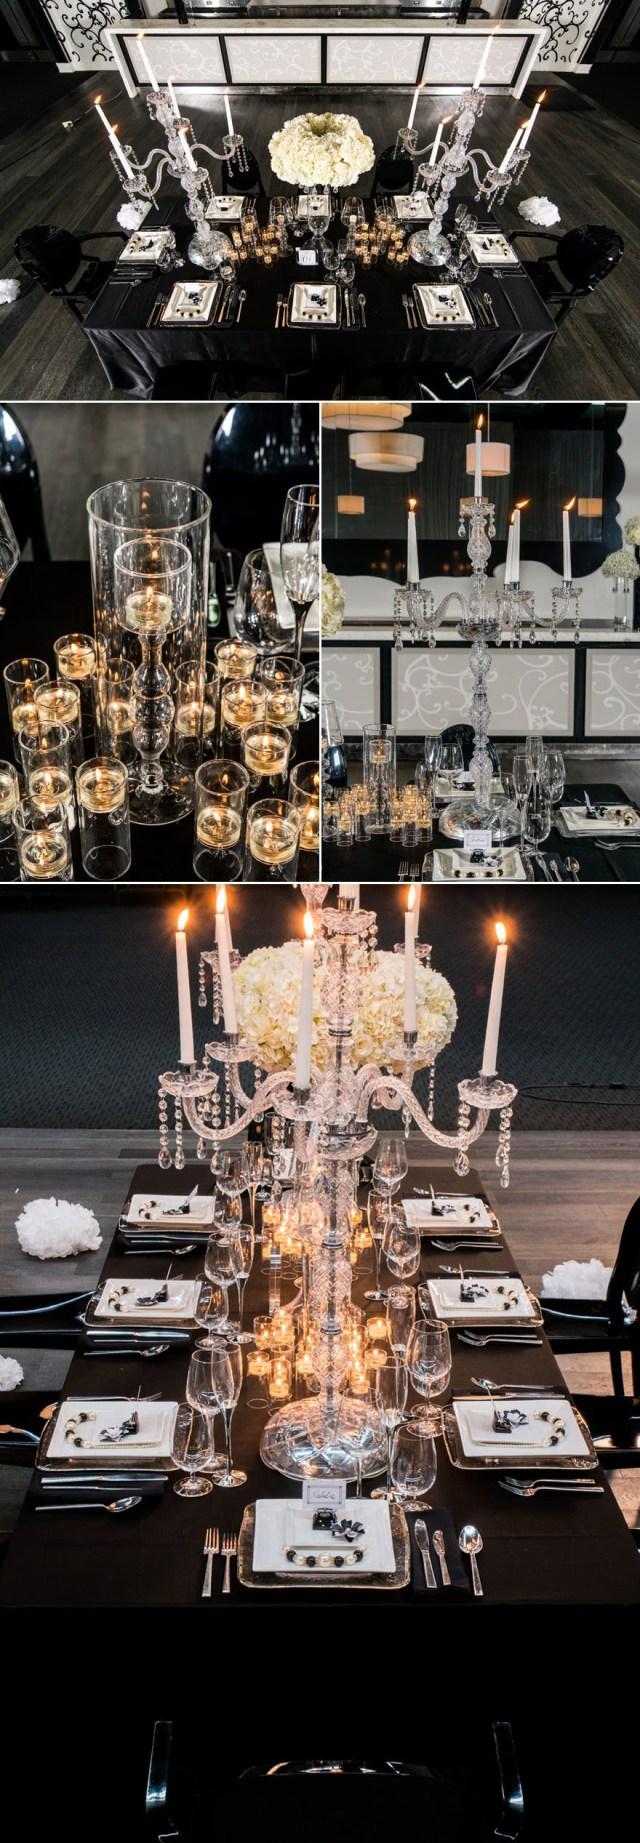 Glamorous Wedding Decorations 50 Stunning Diy Wedding Centrepieces Ideas And Inspiration